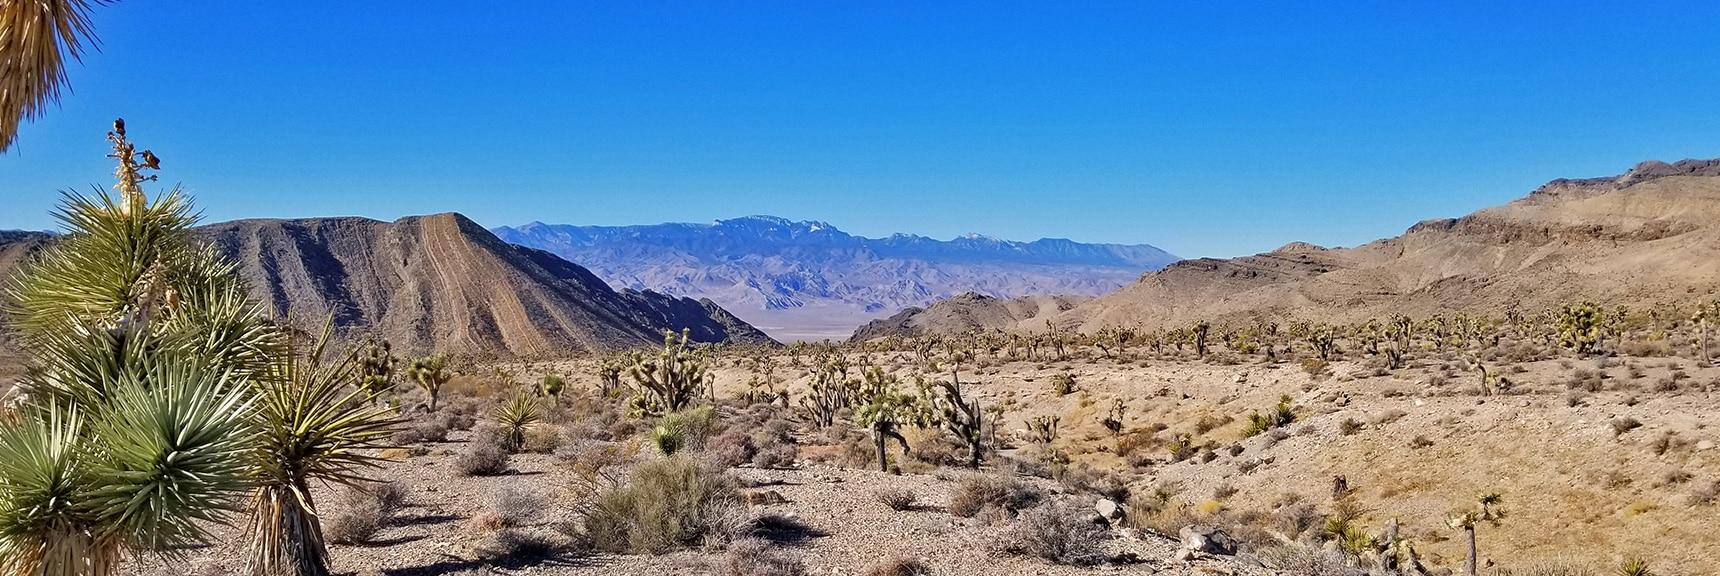 View Through Yucca Gap to Mt. Charleston Wilderness   Lower Mormon Well Road   Sheep Range, Desert National Wildlife Refuge, Nevada